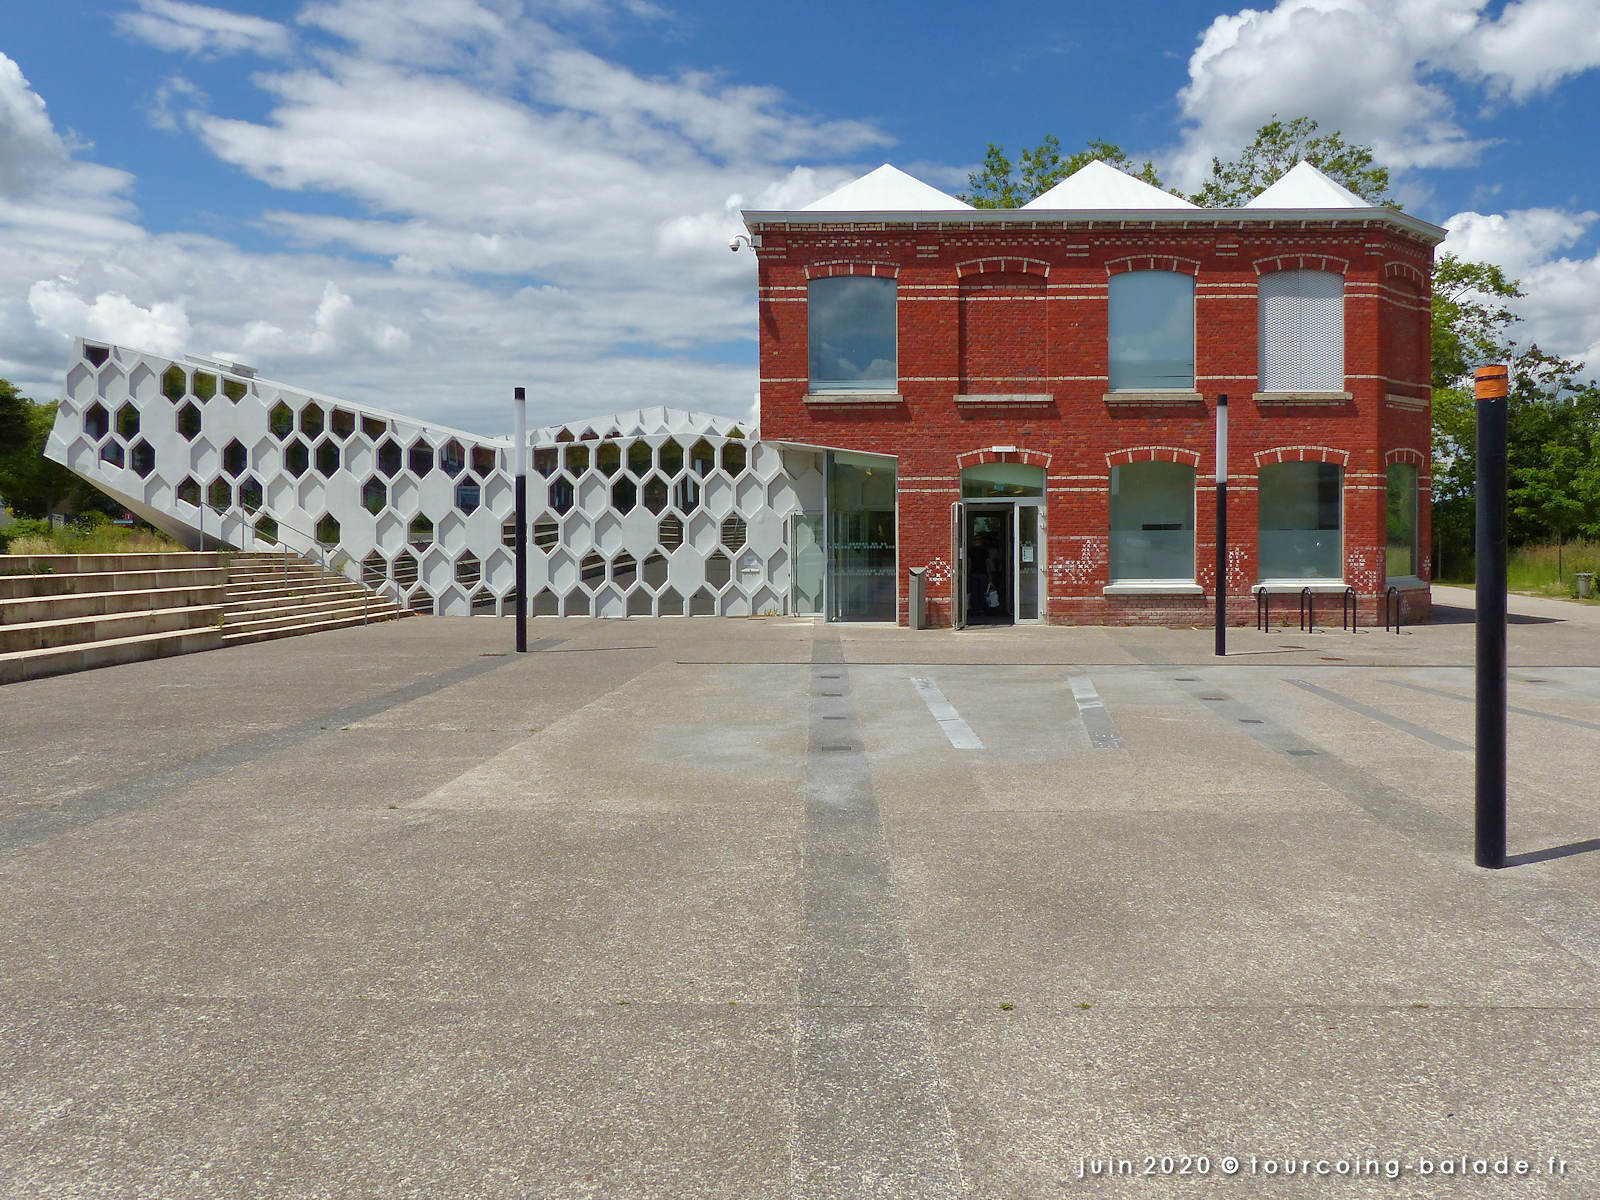 Médiathèque Chedid, Tourcoing Belencontre, 2020